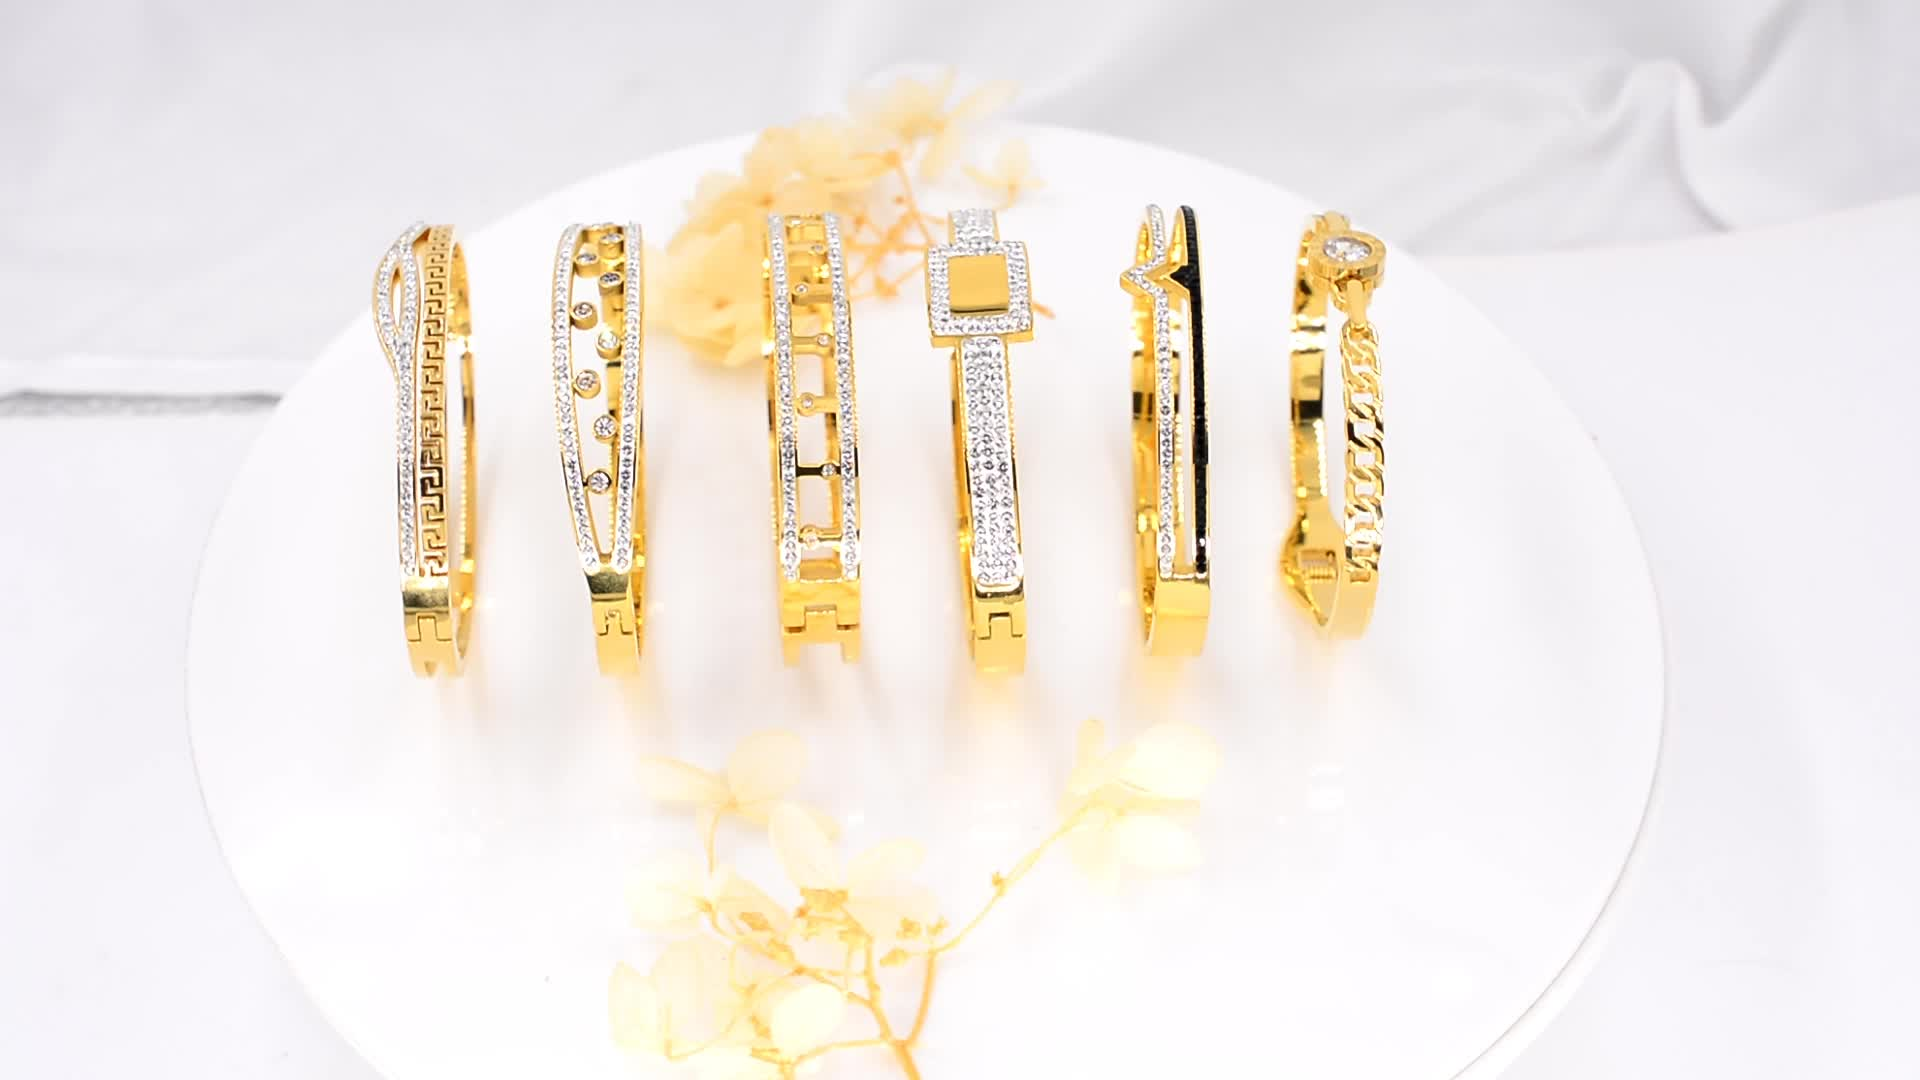 Modalen Steel Hollow Cuff Bracelet High Quality for Ladies Rhinestone Gold Plated Bangle